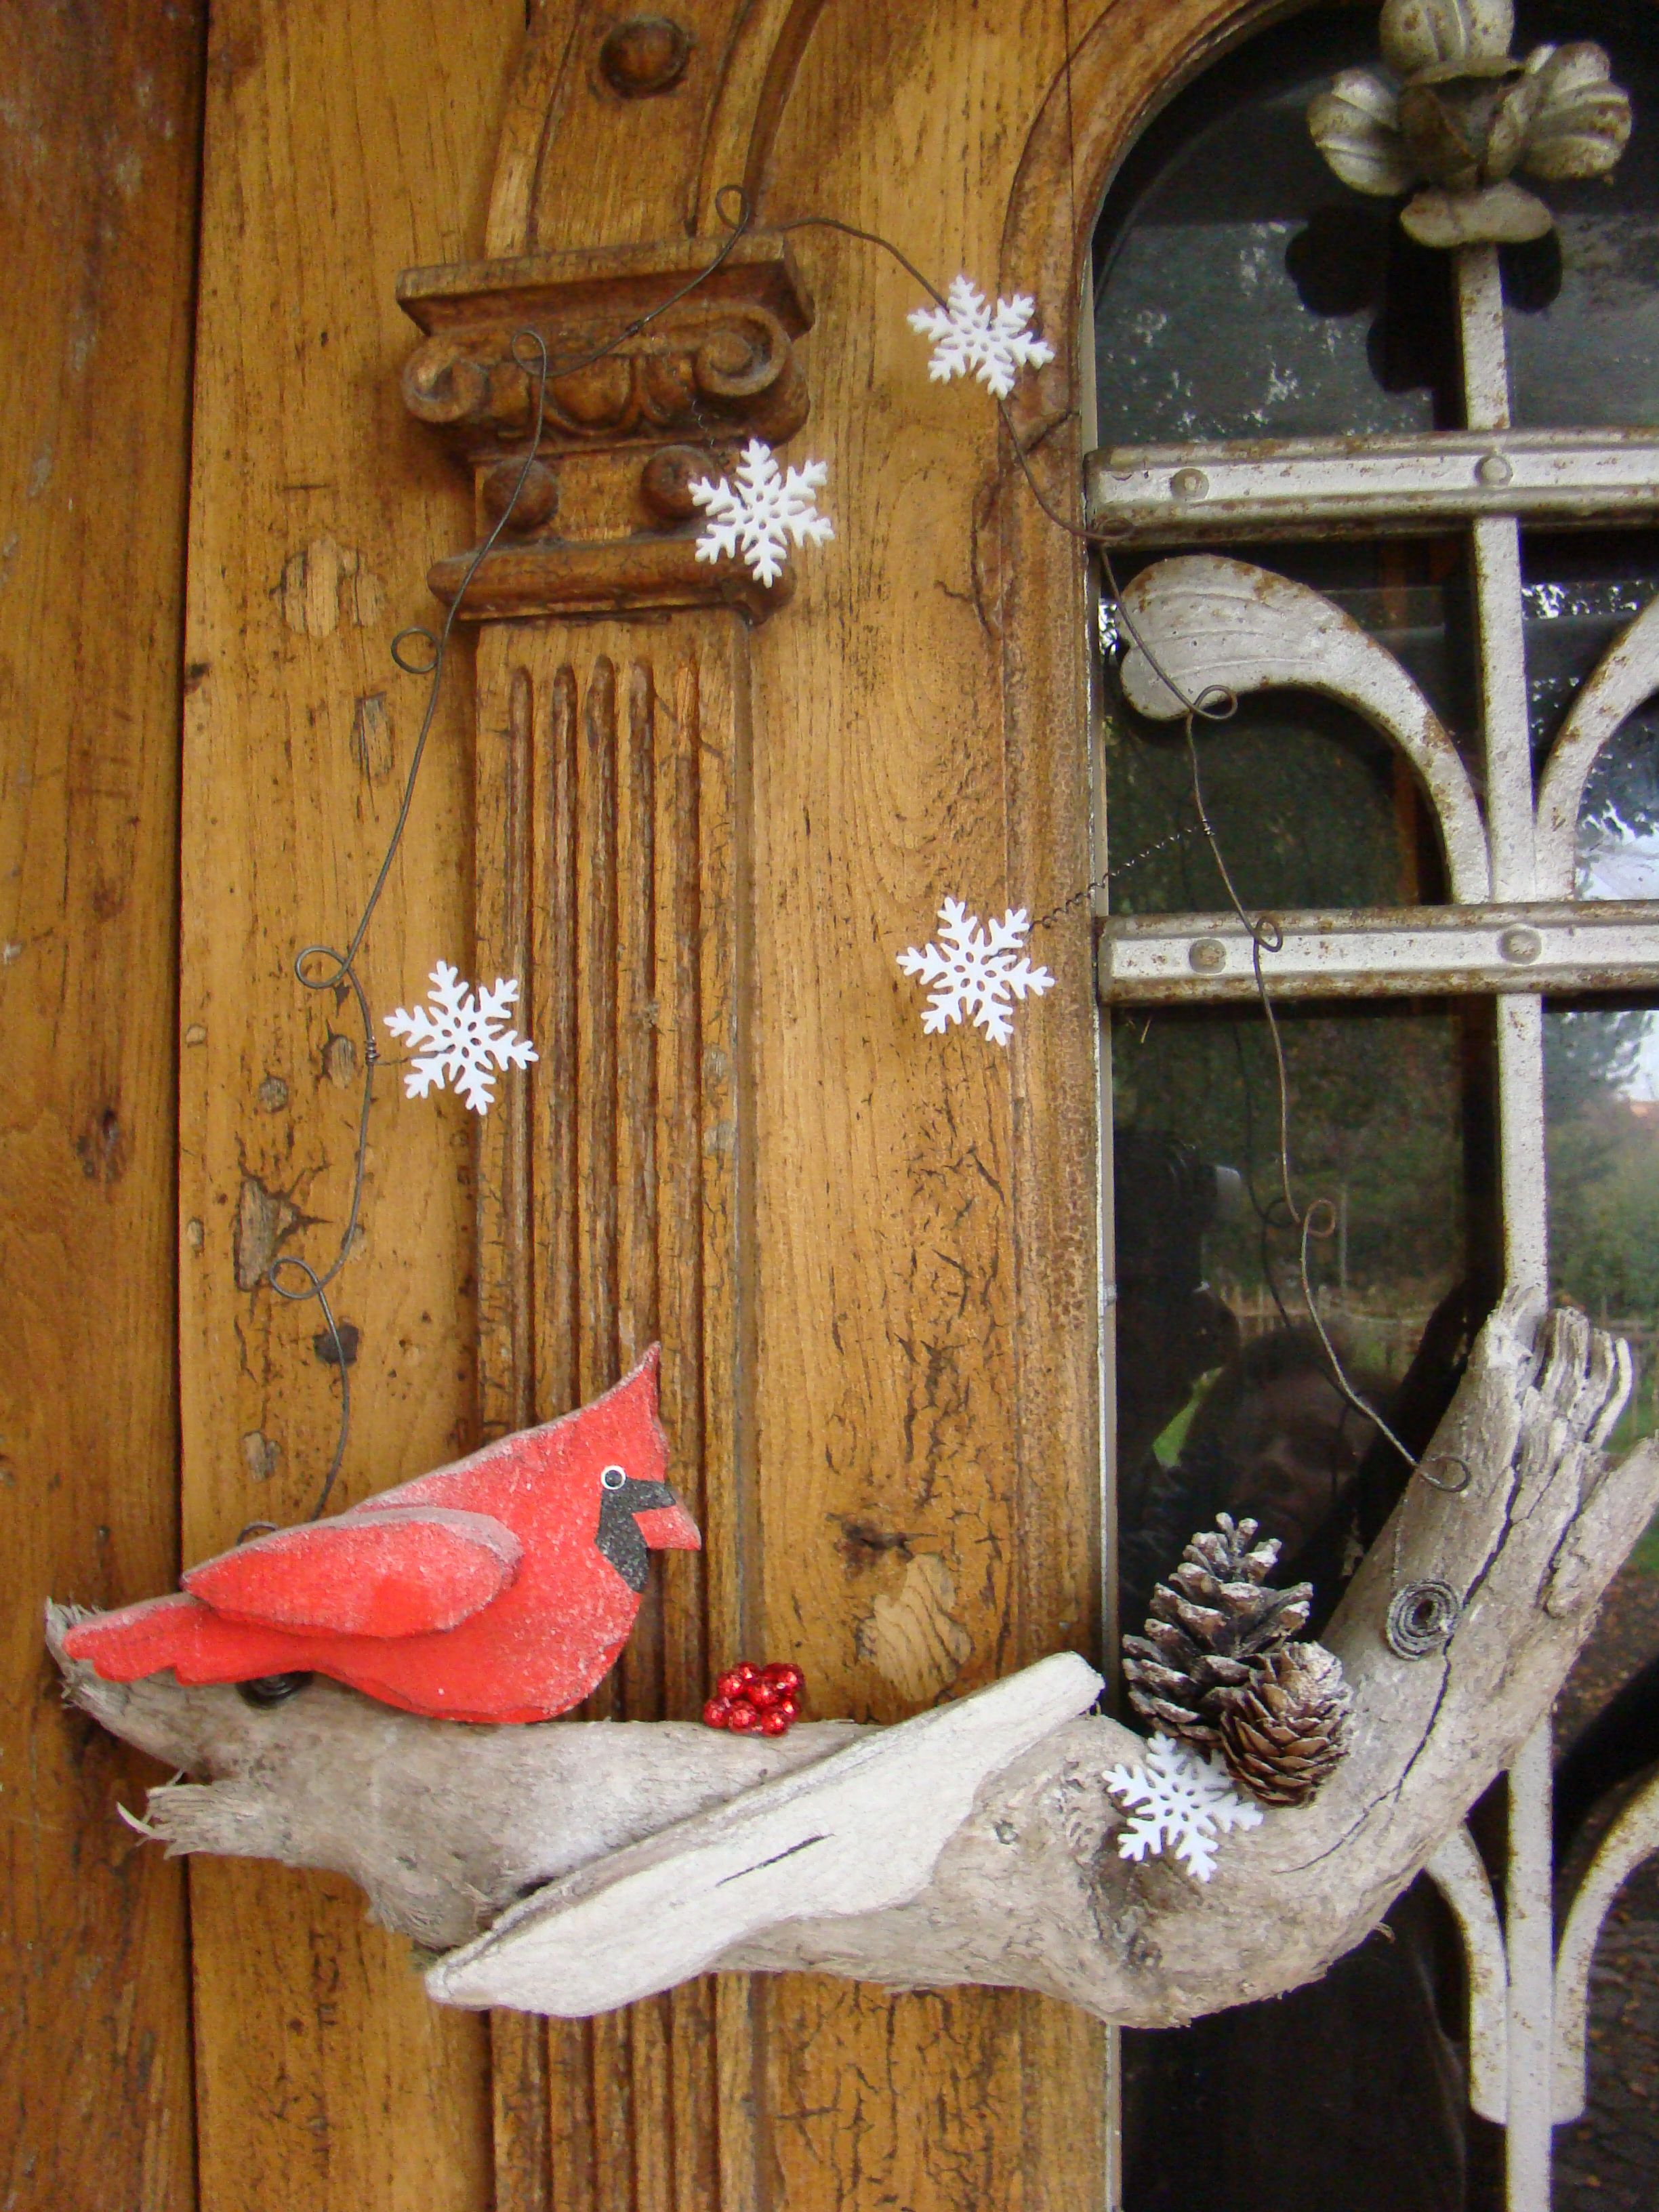 wonderful ornament for christmas +++ wunderschöne